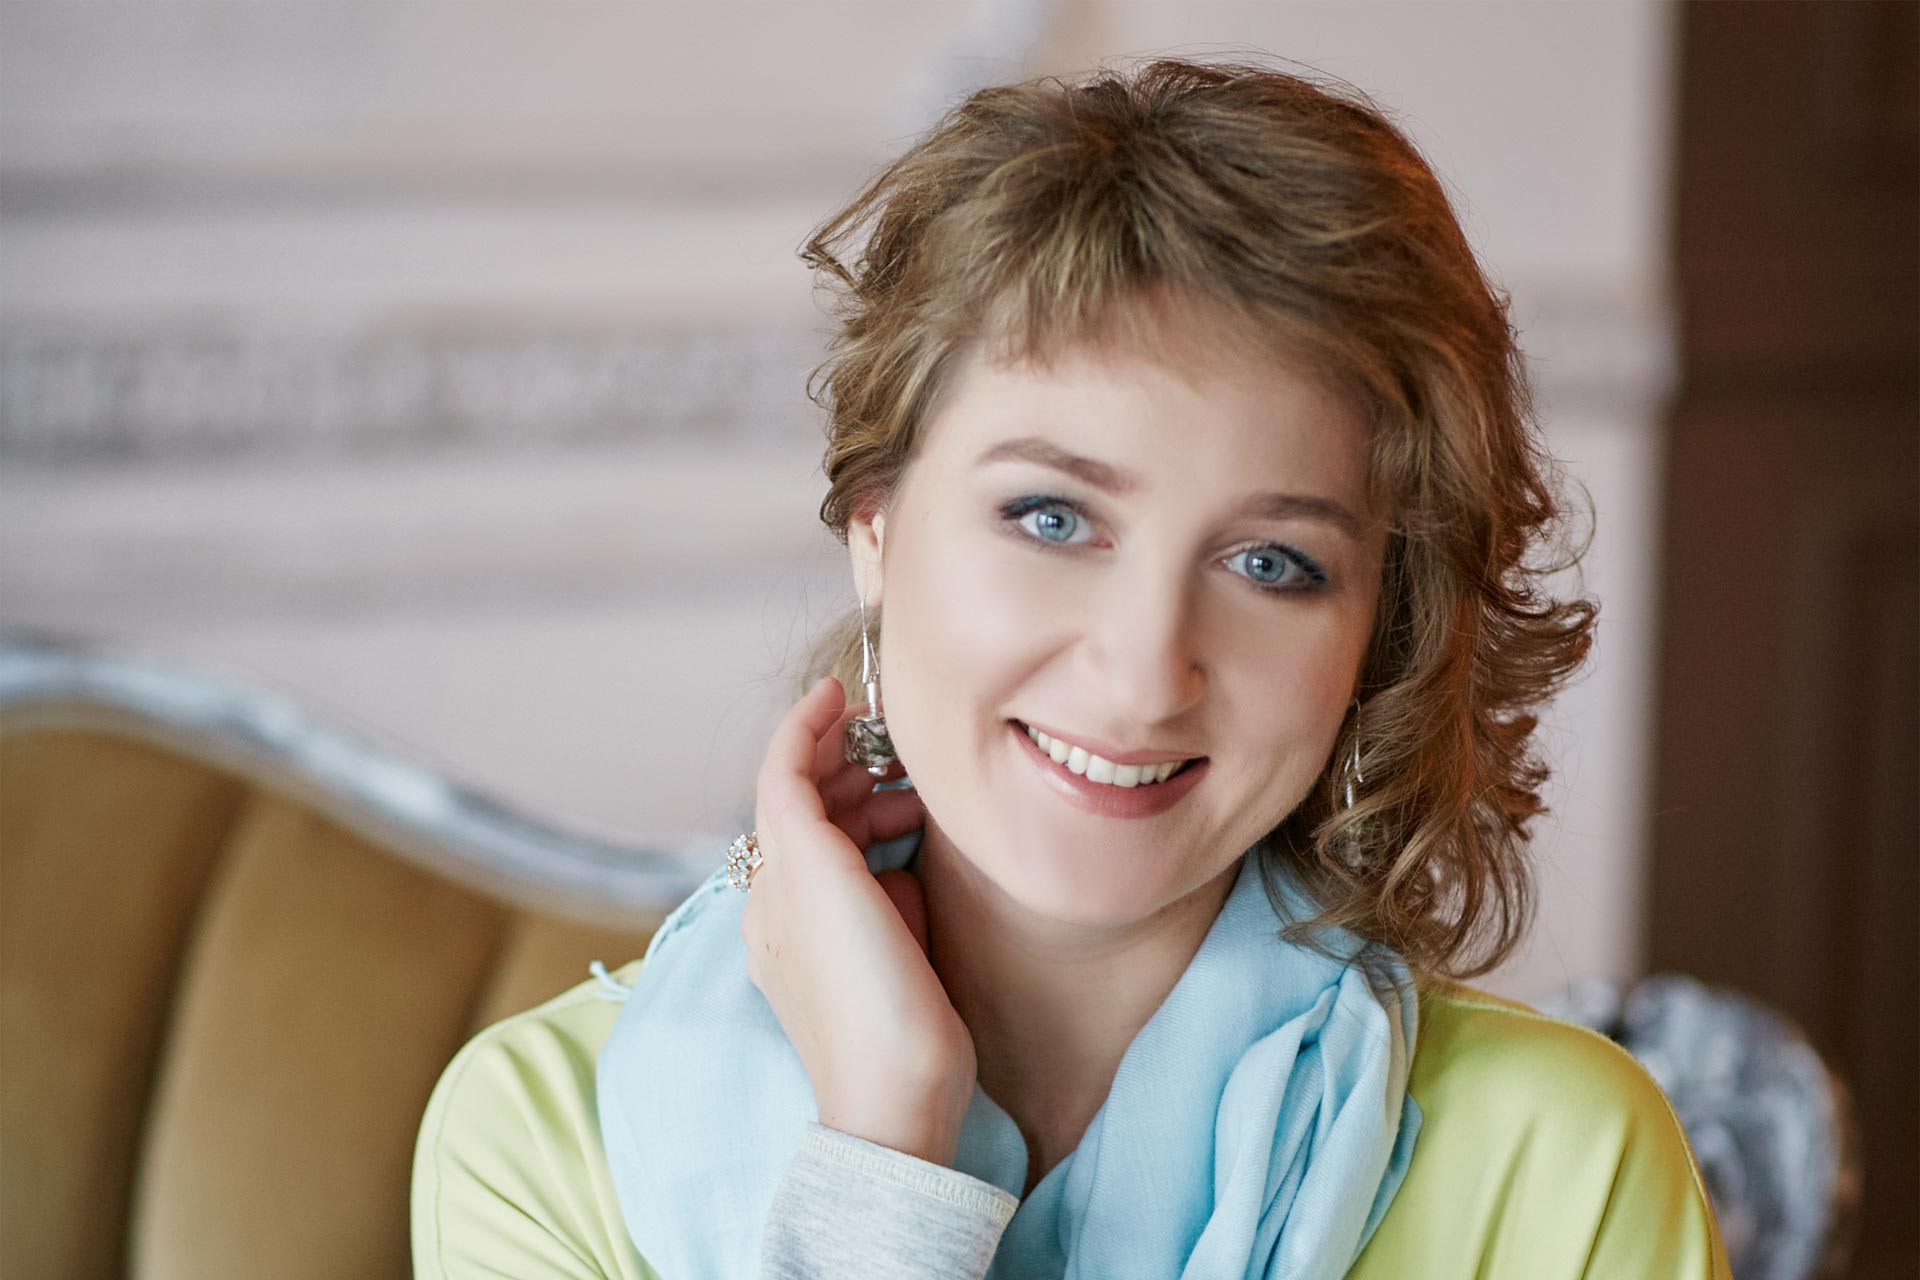 Ирина Захарьина, тренер по личностному росту и развитию осознанности, коуч